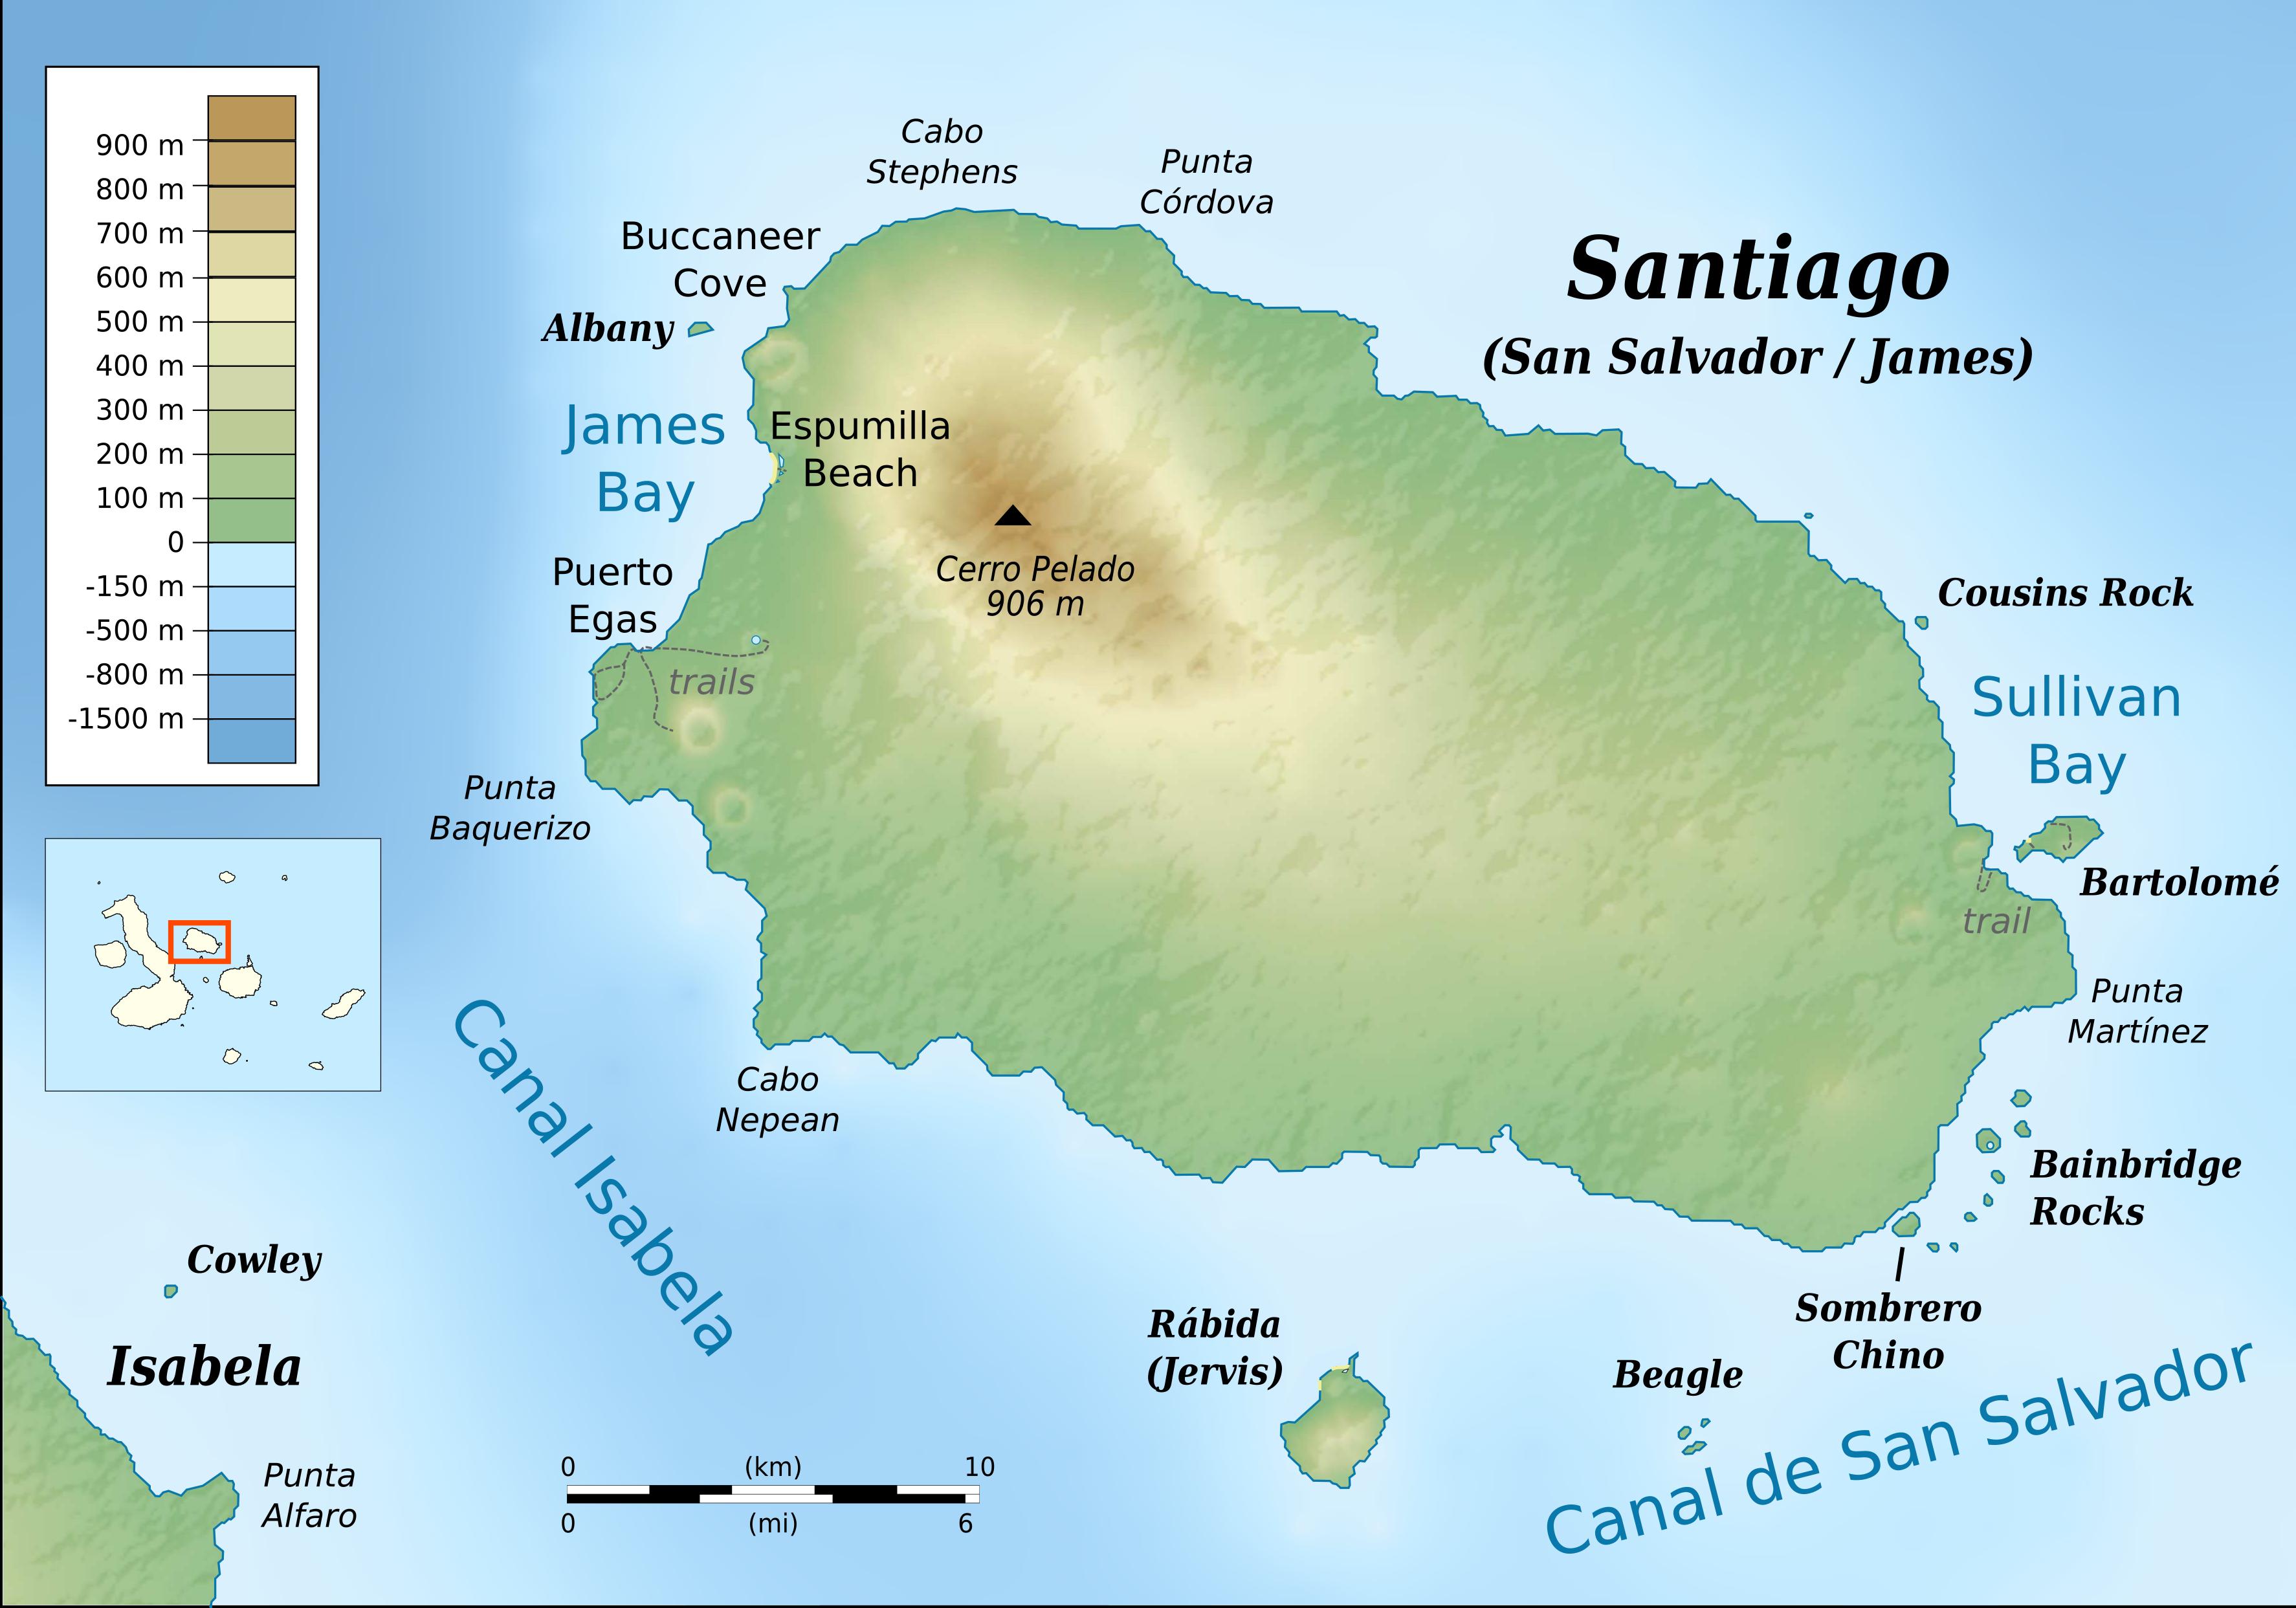 File:Santiago (Galapagos) topographic map-en.png - Wikimedia ... on puerto ayora, pinta island, amazon map, puerto baquerizo moreno, yucatan peninsula map, brazilian highlands map, cuba map, oman map, isabela island, bahamas map, lesser antilles map, ha long bay, genovesa island, puerto rico map, charles darwin research station, nameless island, greenland map, galapagos national park, cape horn map, strait of magellan map, patagonia map, japan map, darwin island, ecuador map, bay of fundy, pampas map, canada map, tierra del fuego map, pacific map, fernandina island, baltra island, lake titicaca map, floreana island, falklands map,